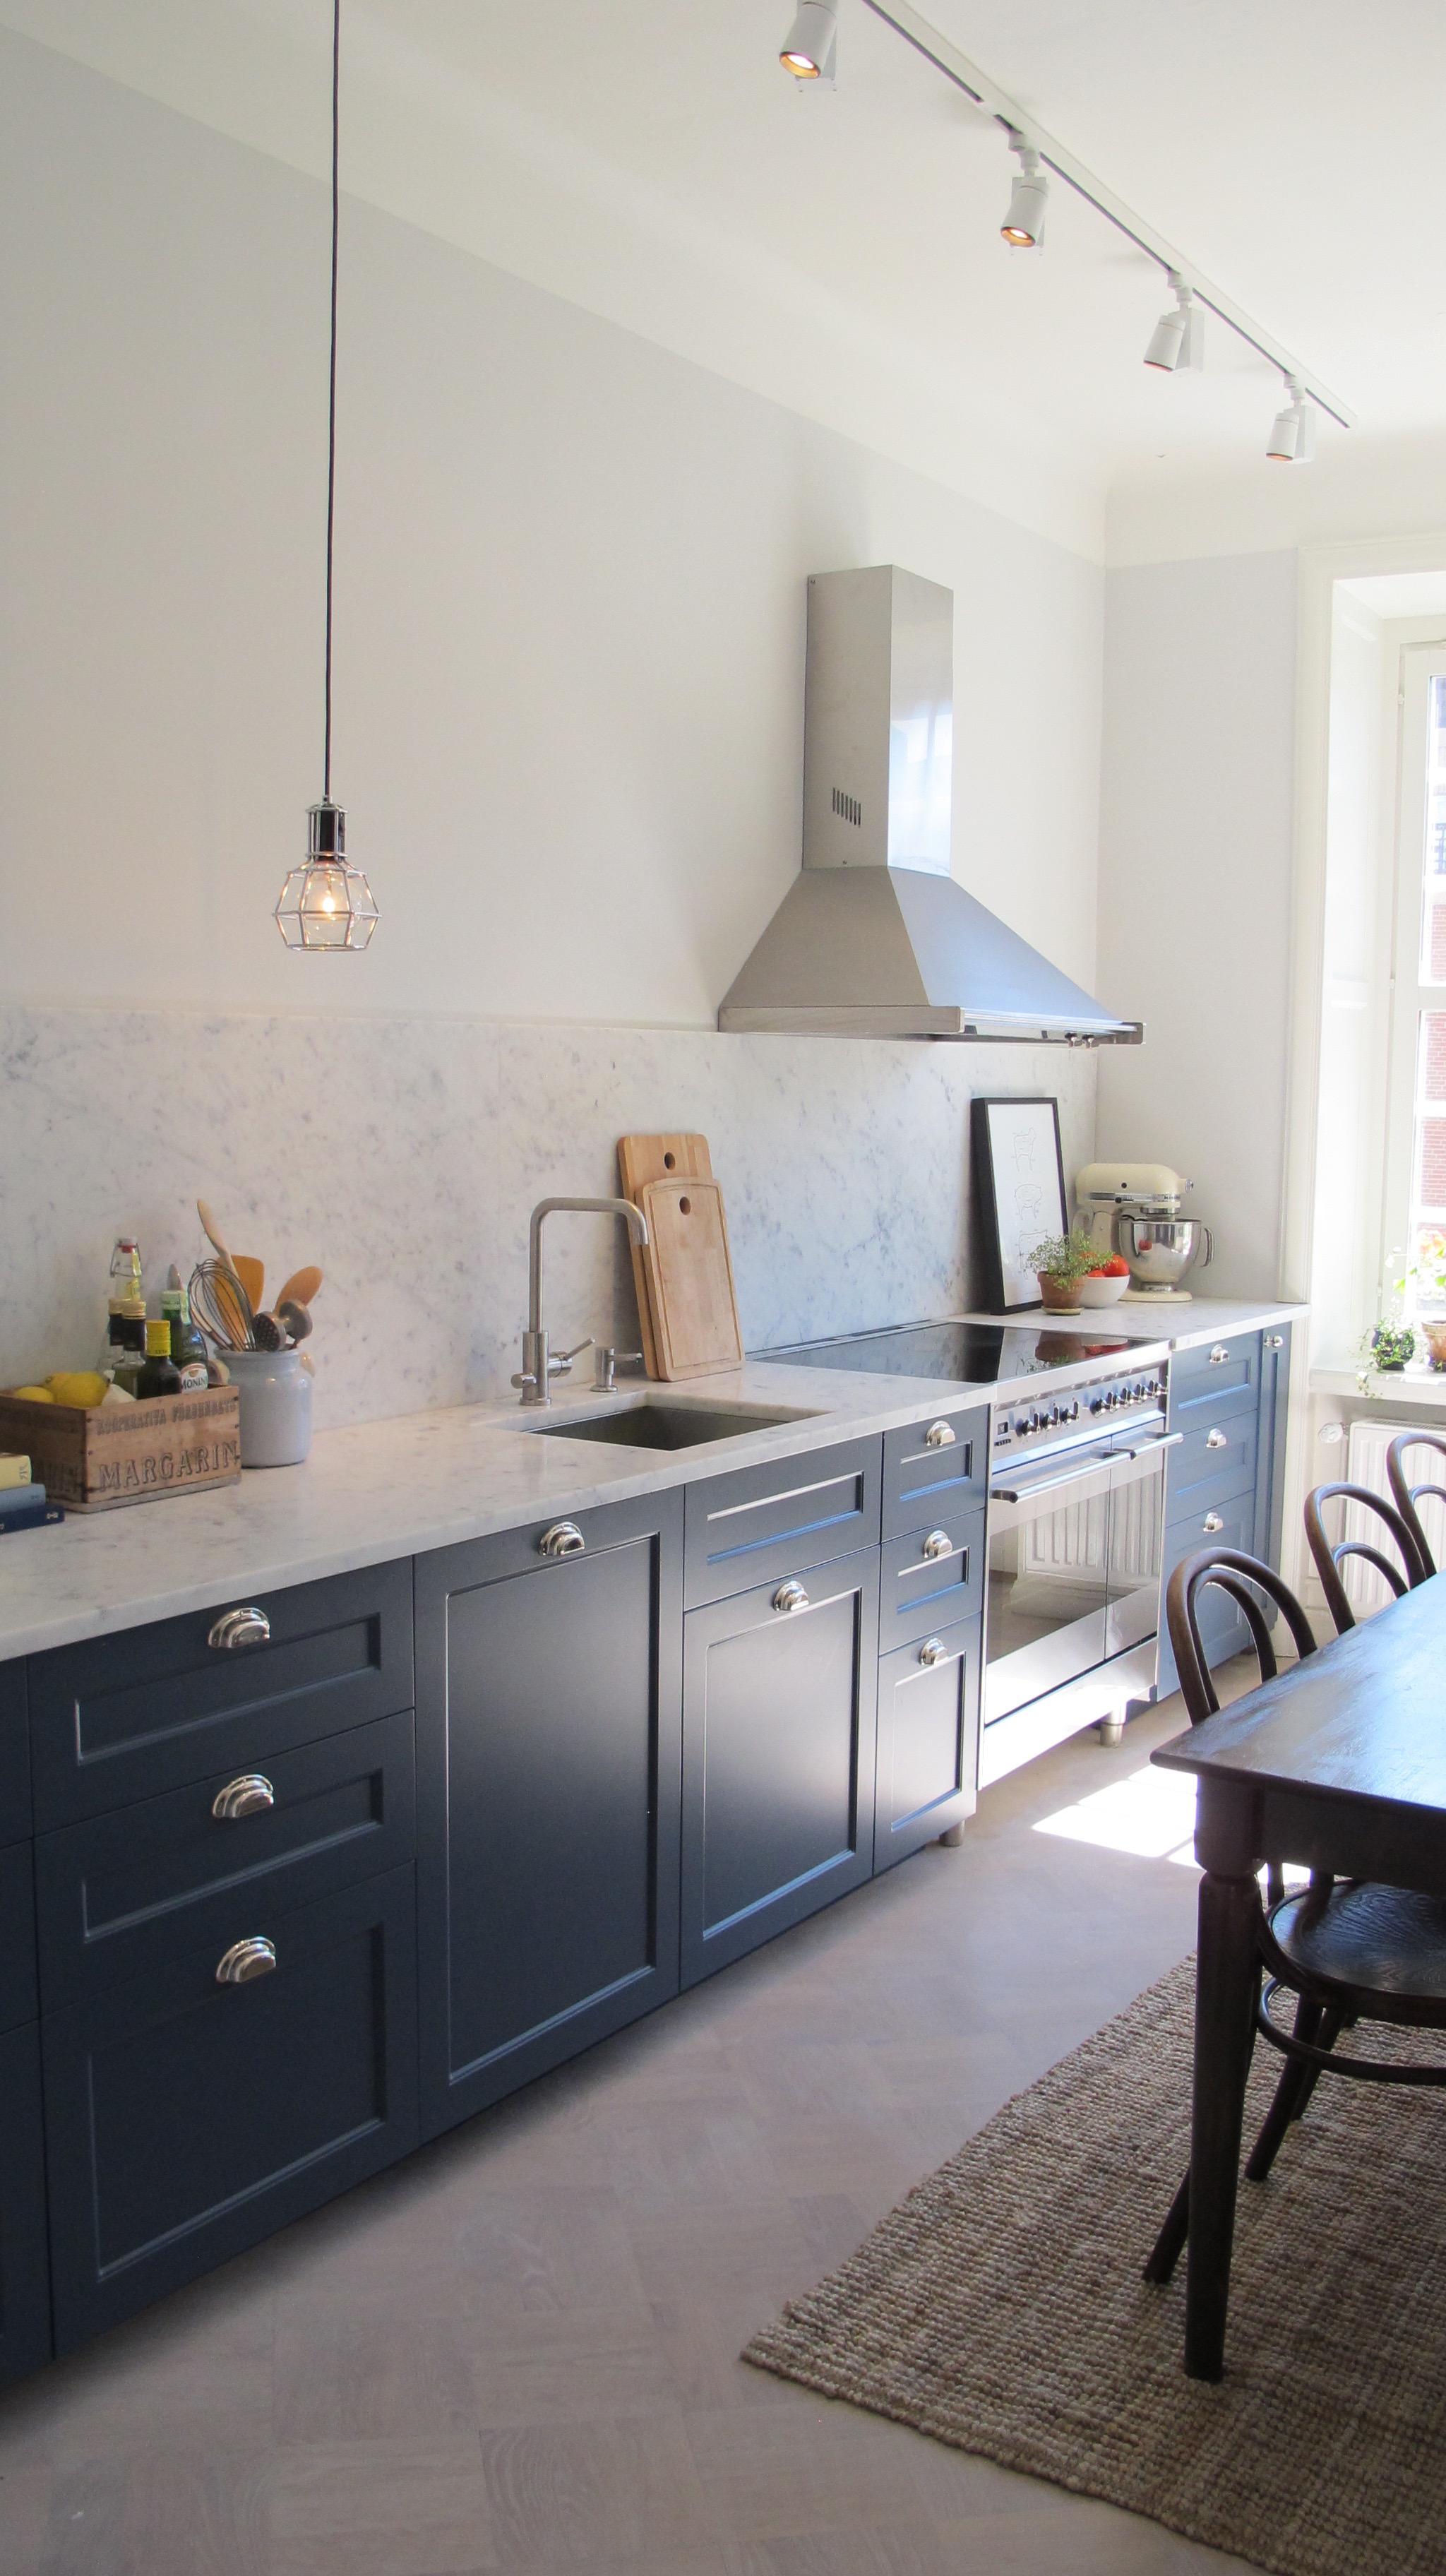 Kok Inredningsdetaljer : Morkblott kok o Interiorstories